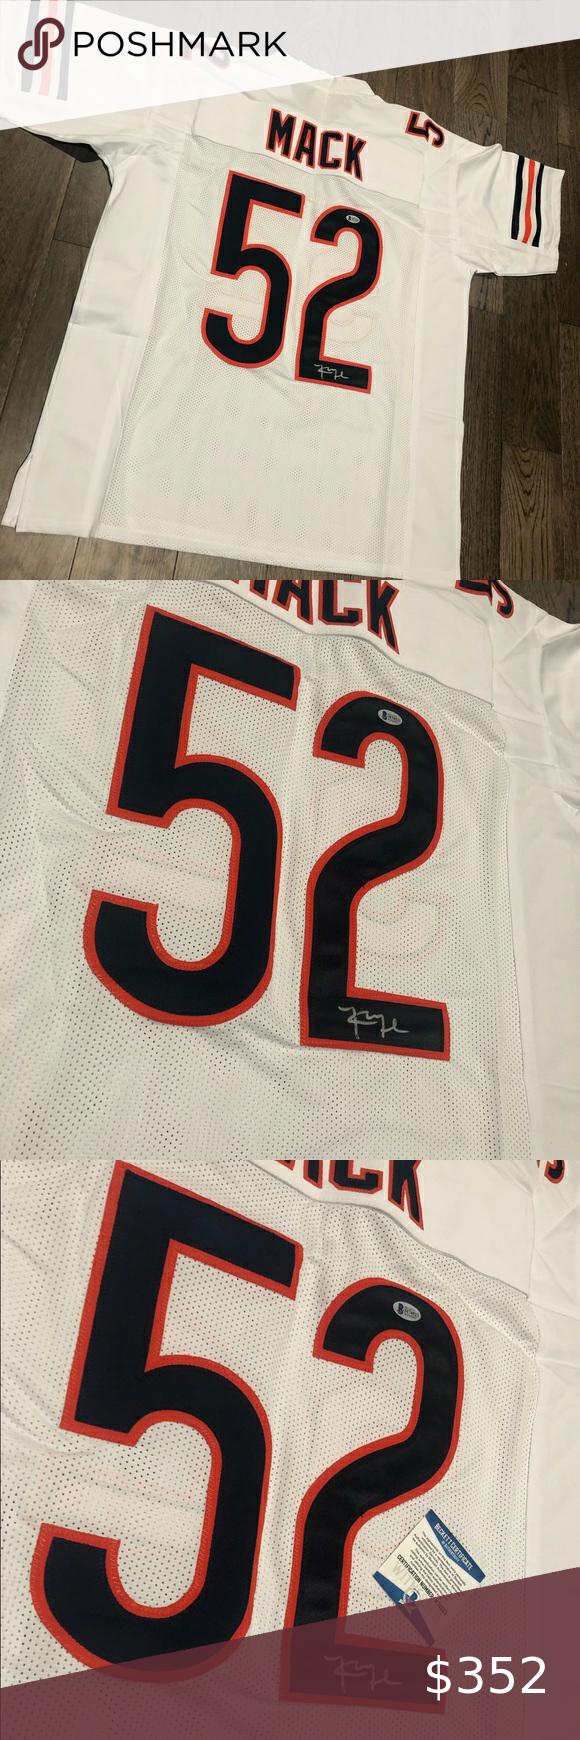 Khalil Mack Signed Jersey In 2020 Clothes Design Mack Retail Logos